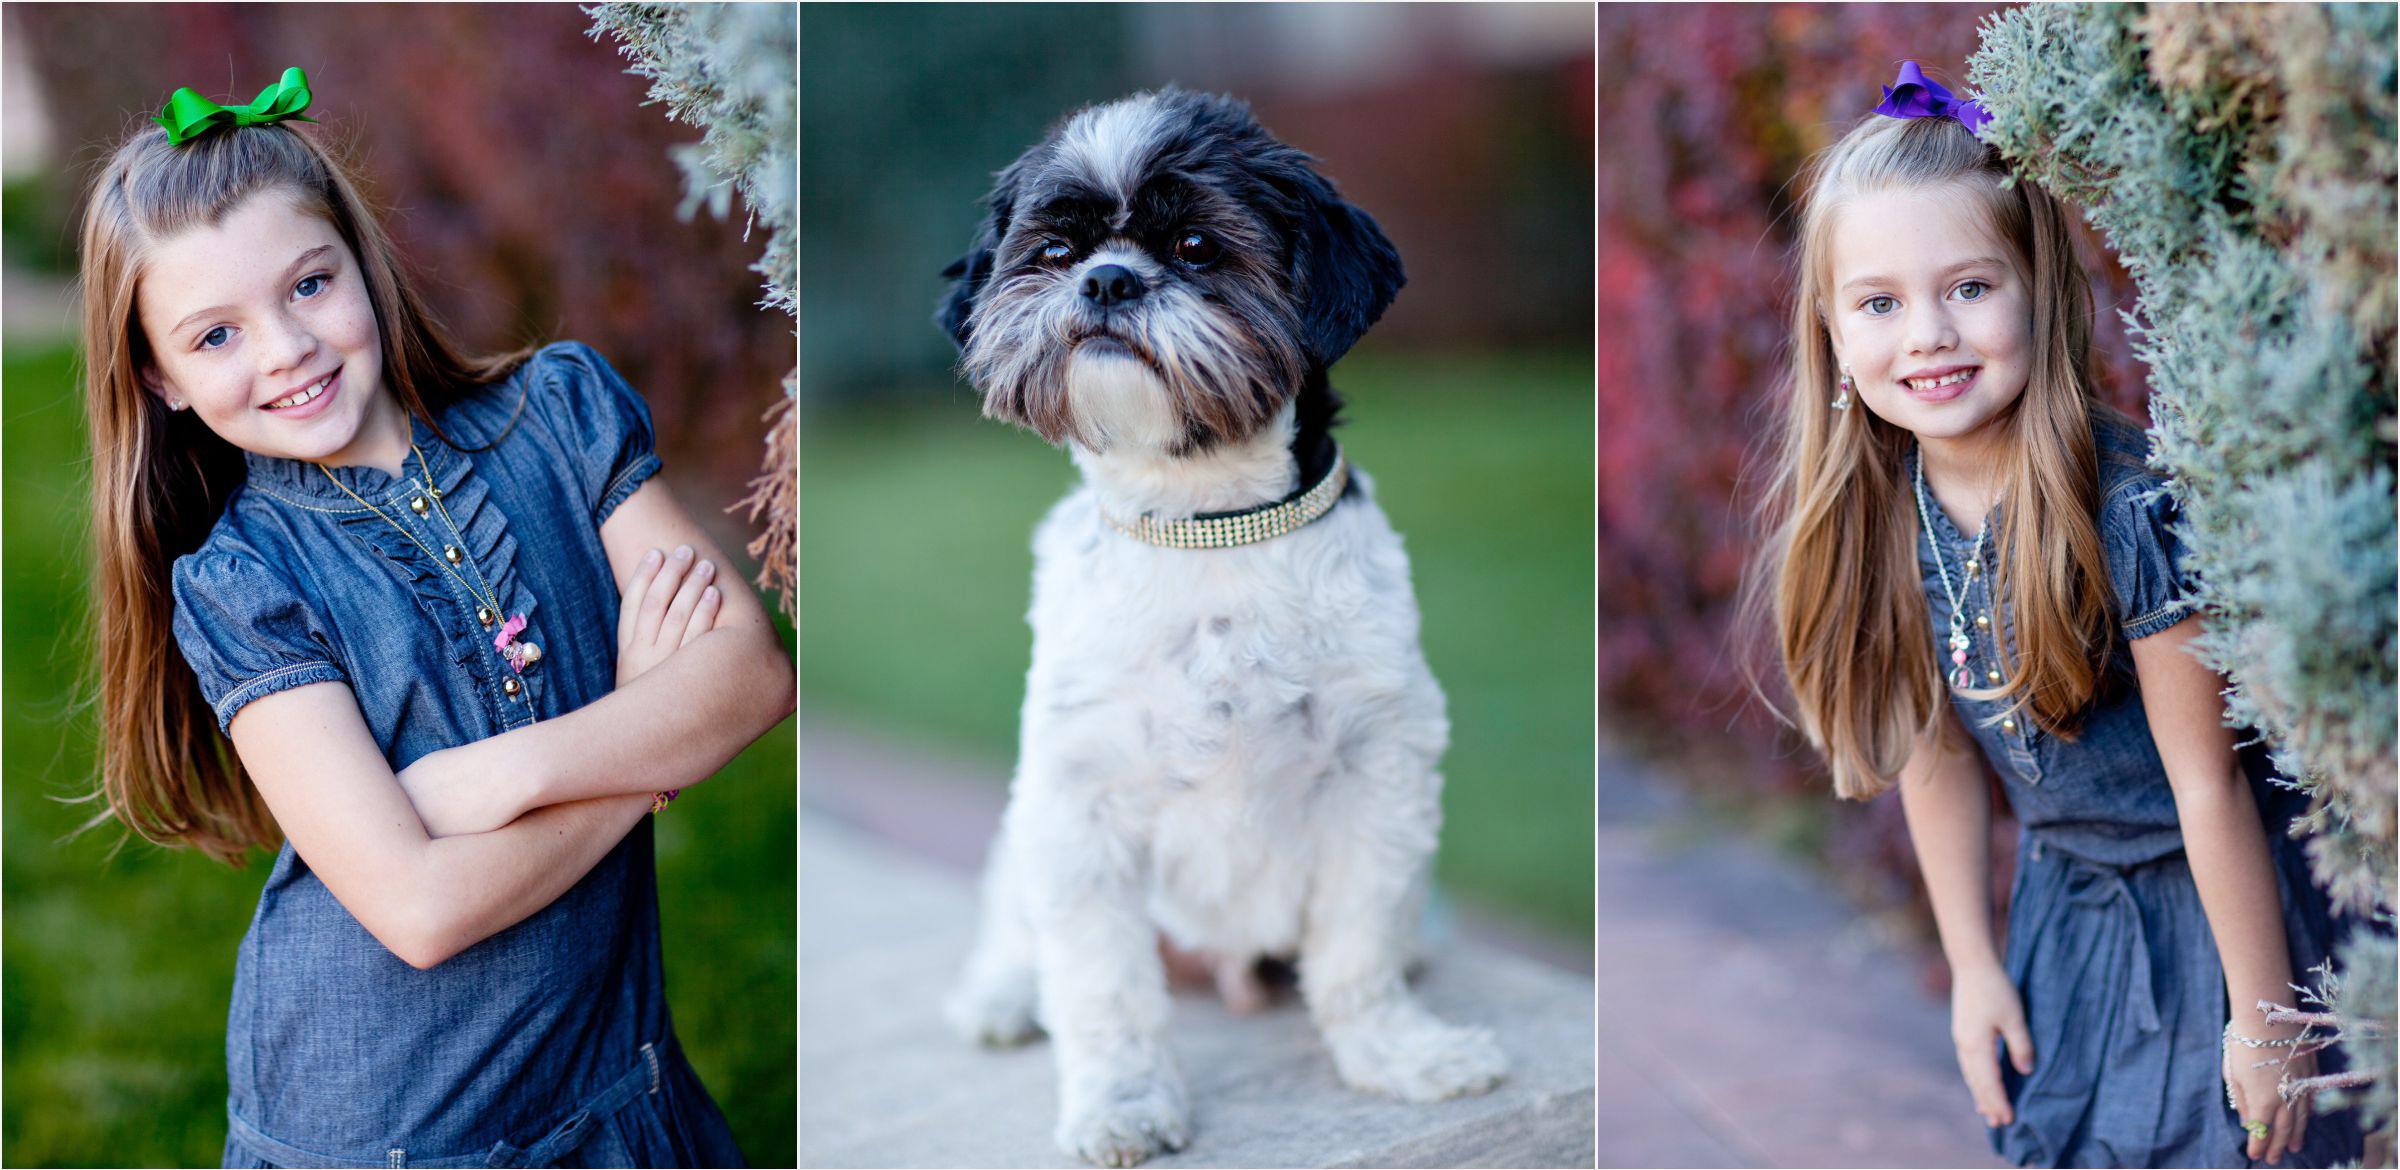 fun-sisters-and-their-dog-at-Denver-university-photo-shoot-006